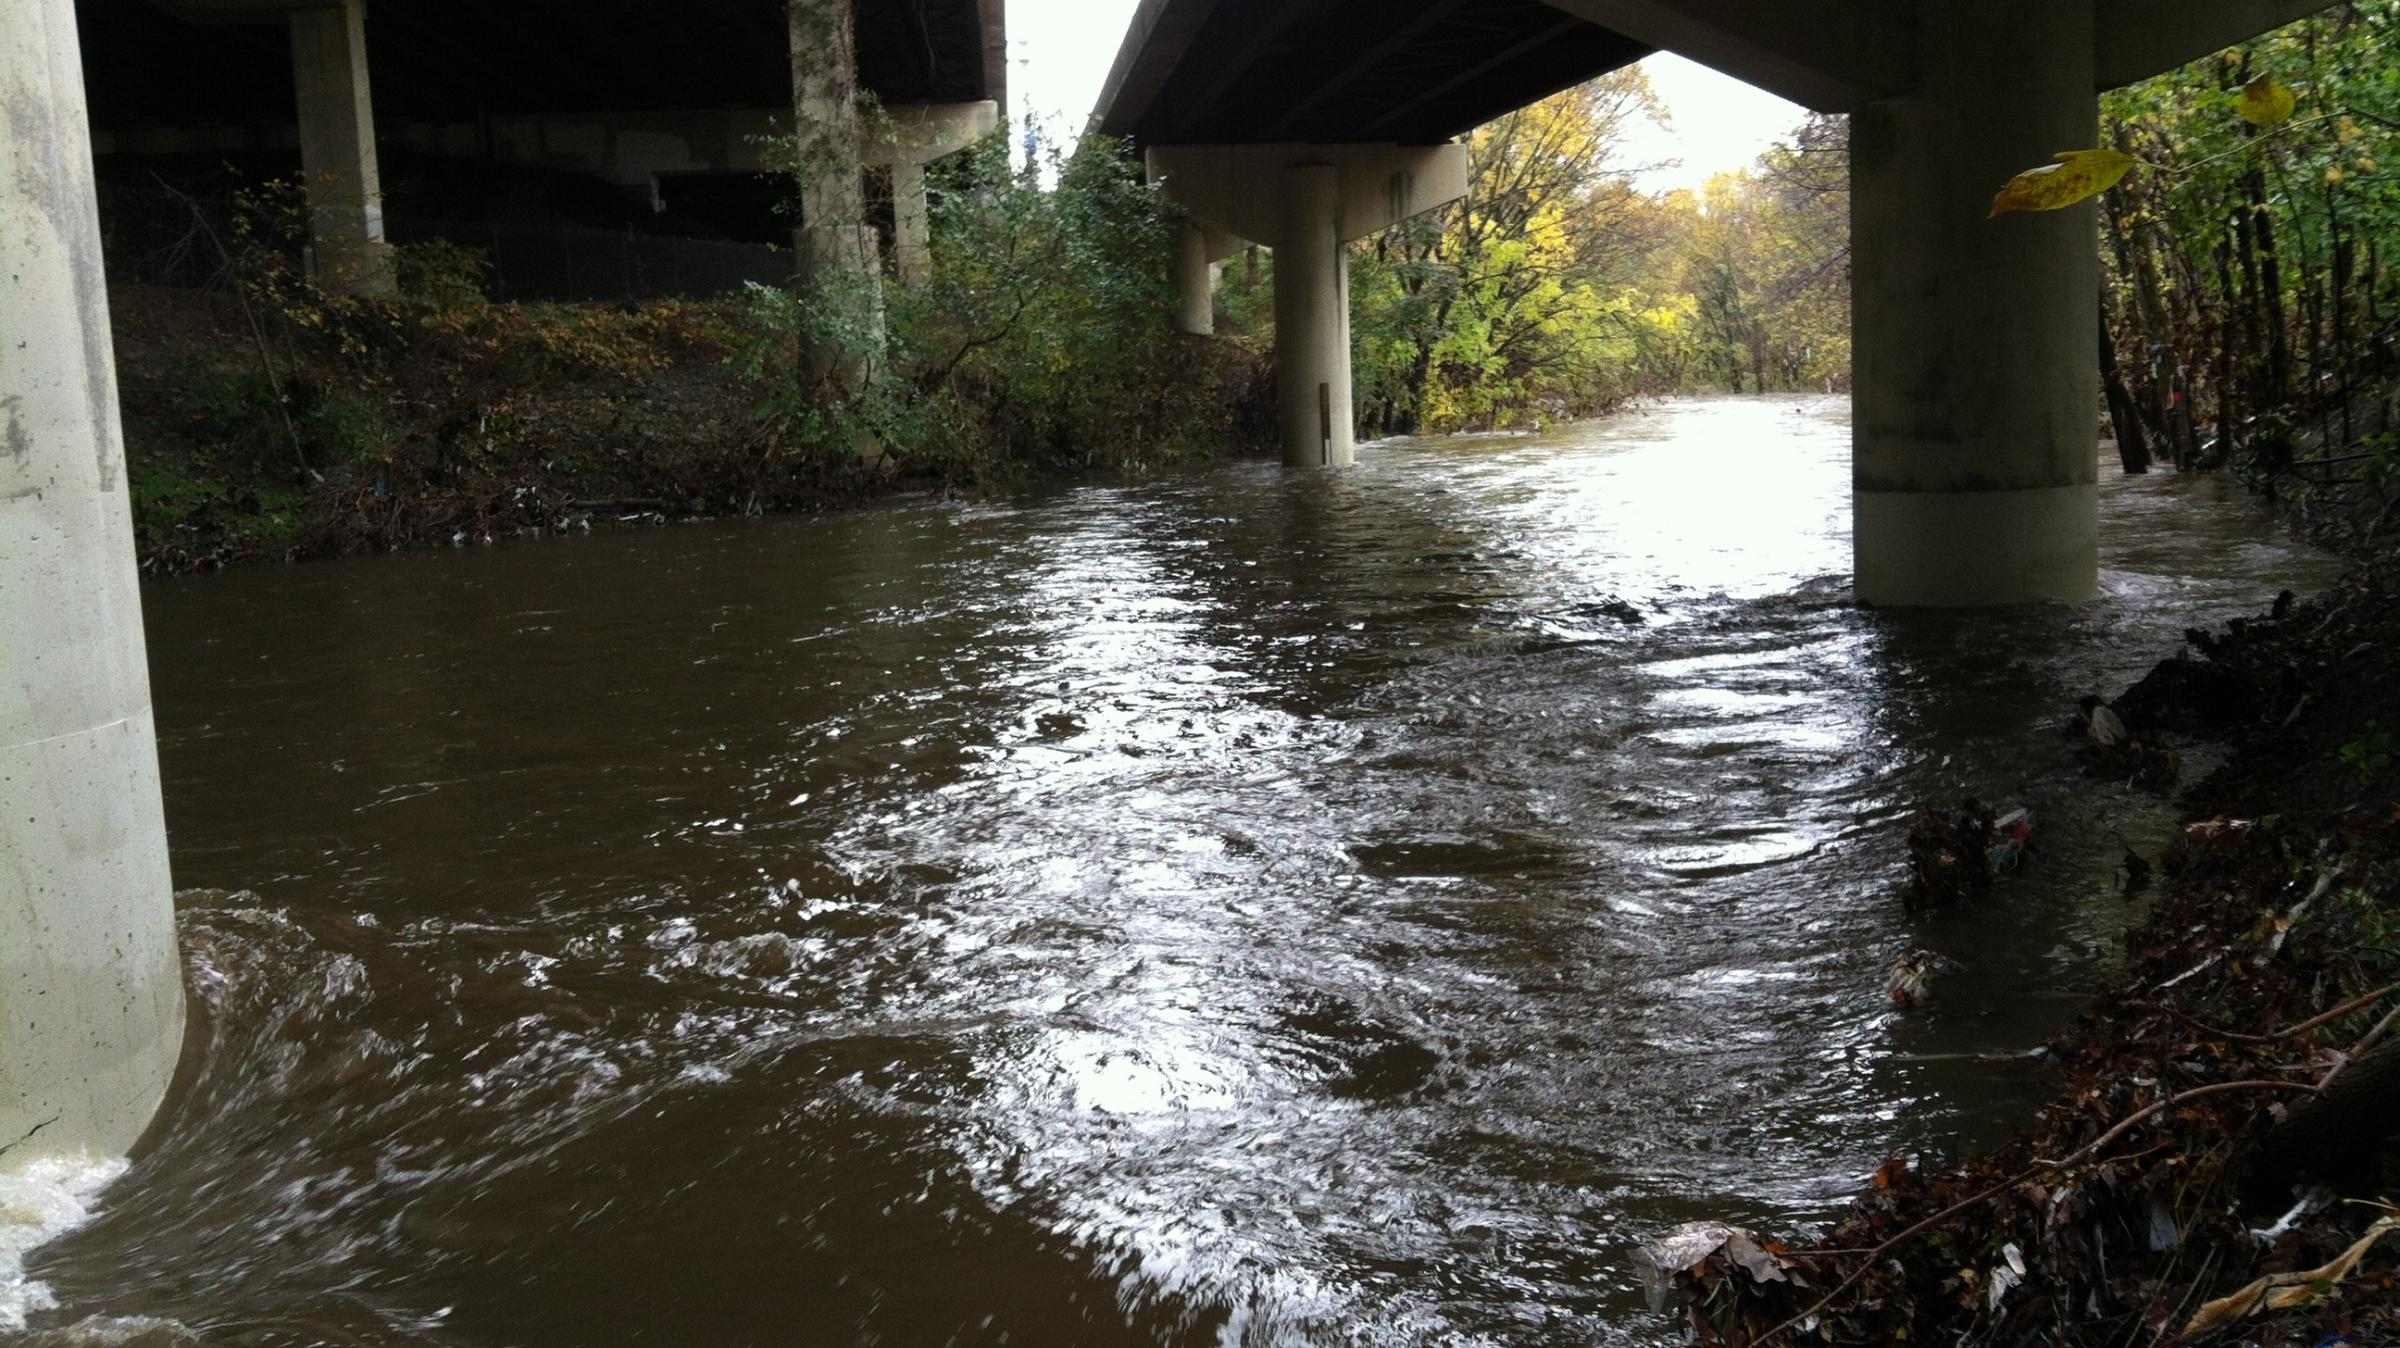 Scientific research on acid rain